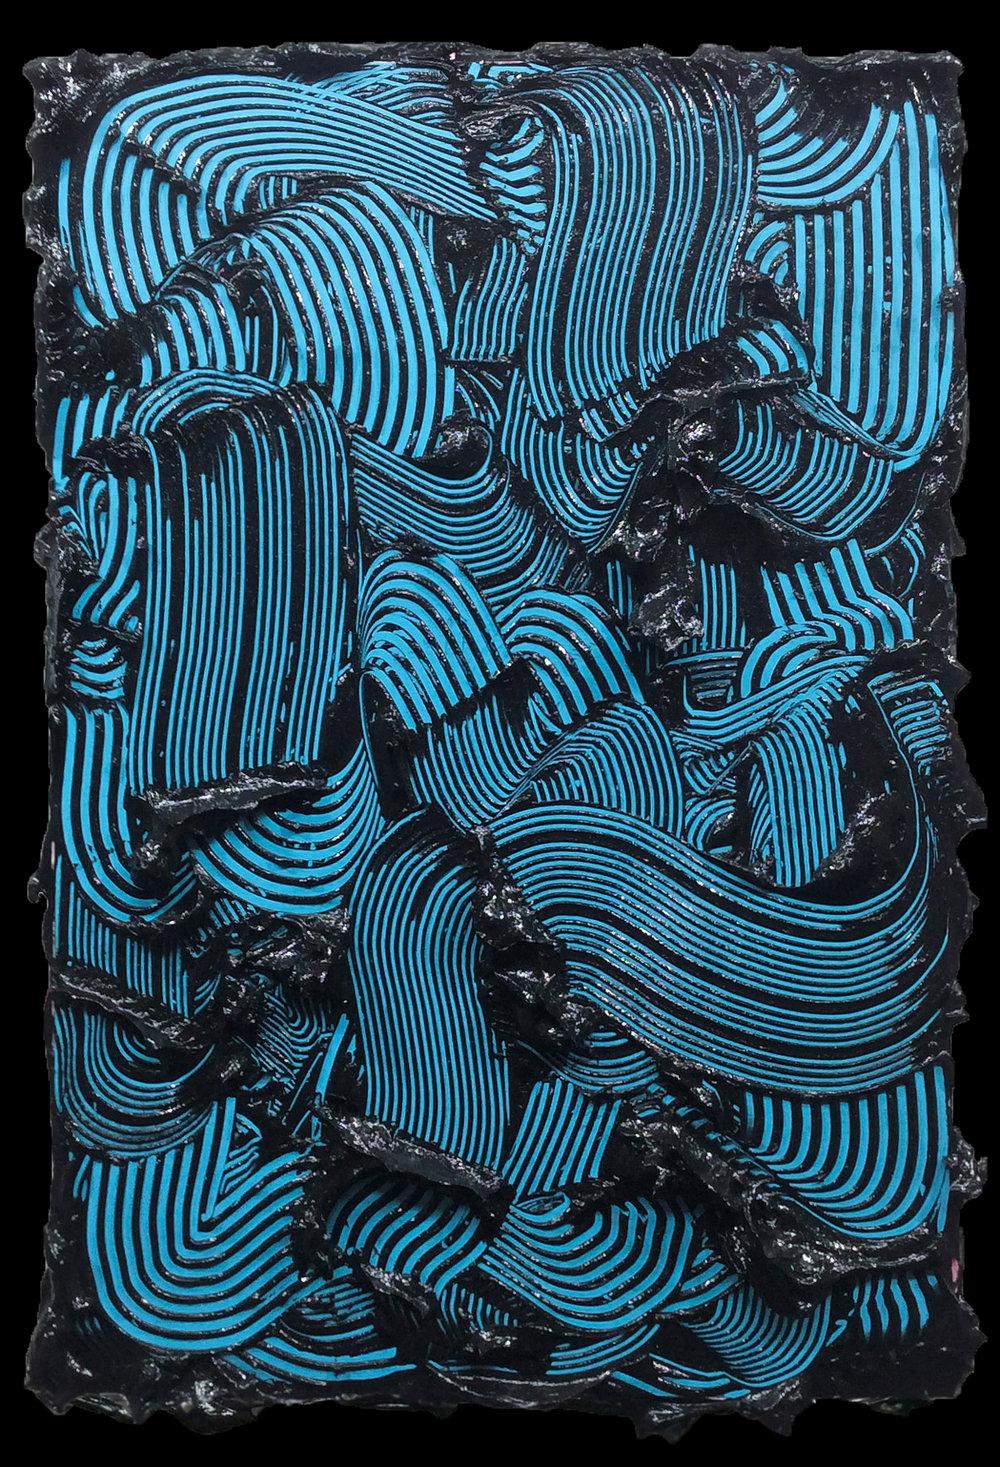 Tim-Nikiforuk---Poseidon_black bg.jpg